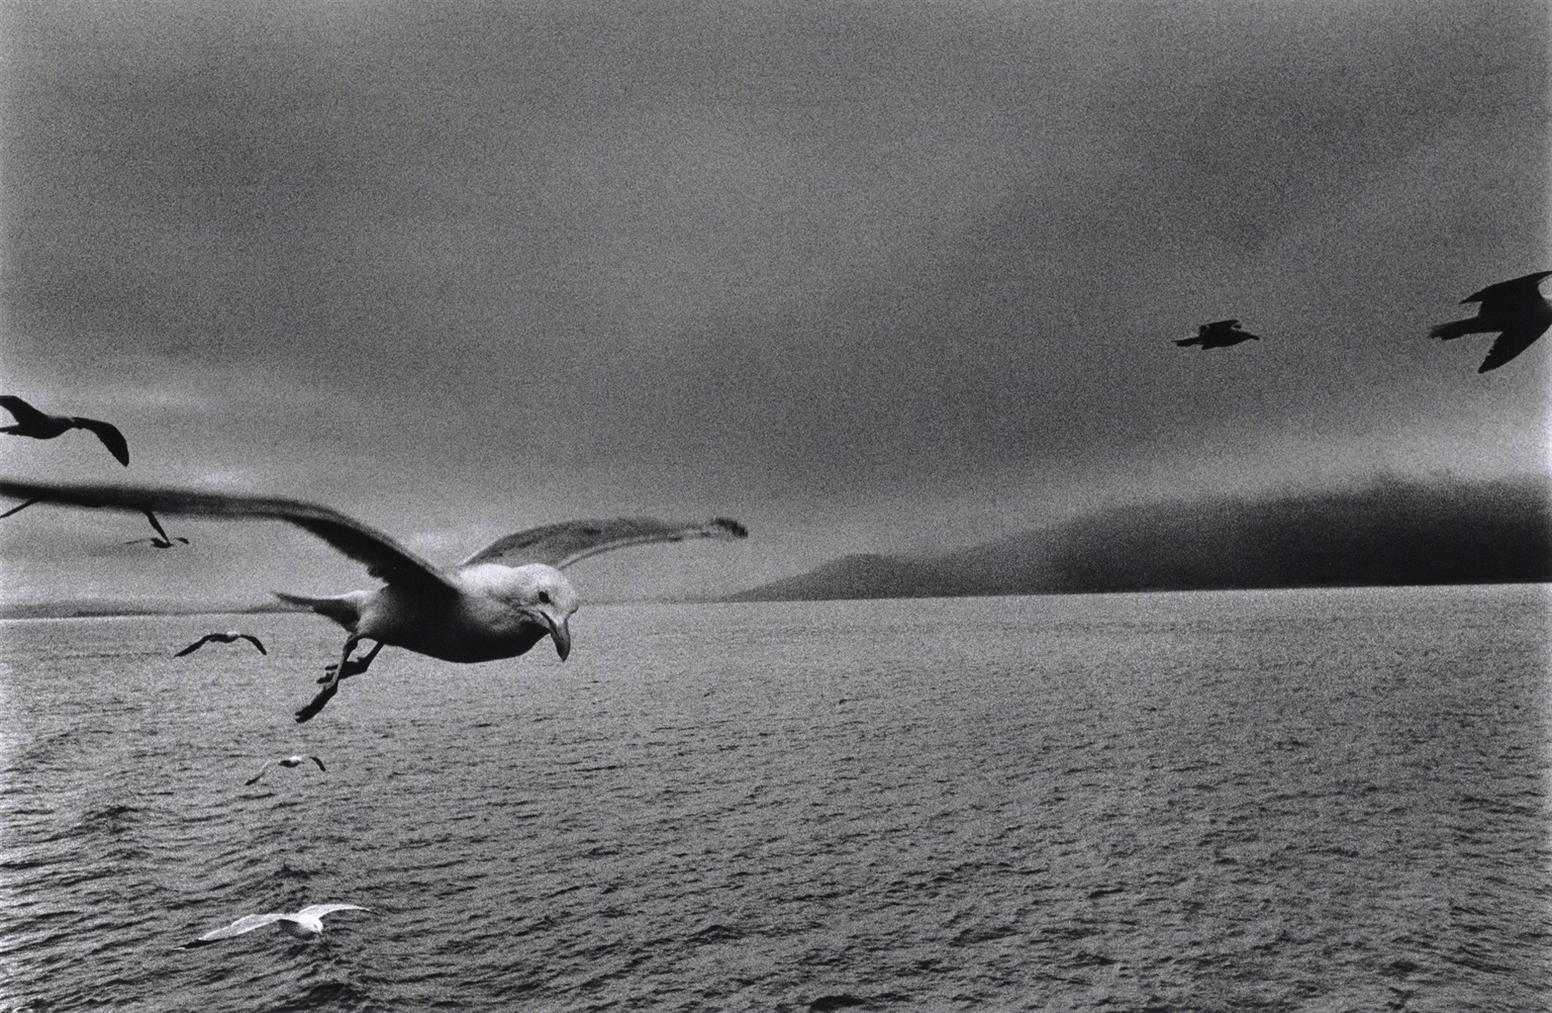 Josef Koudelka-Scotland-1977